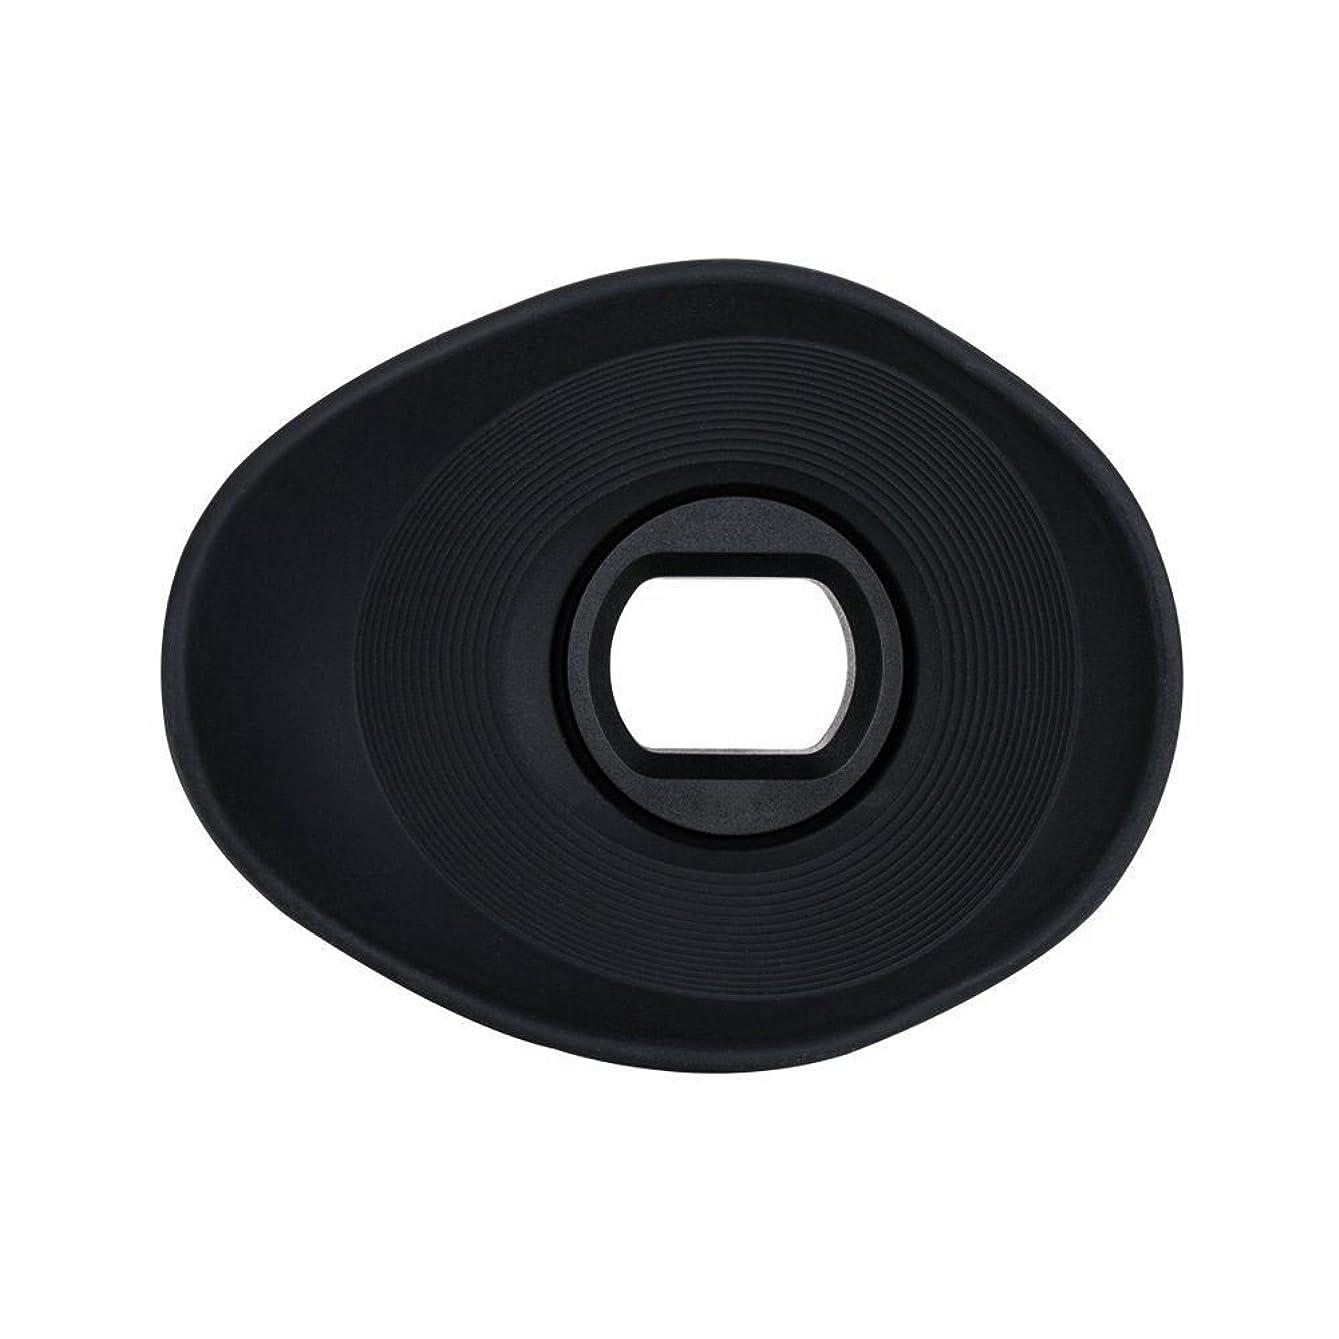 JJC Eyecup Eye Cup Eyepiece Viewfinder for Nikon D5 D500 D810A D810 Df D4S D800E D4 D800 D2 D3 Series Digital Camera Replaces Nikon DK-19 ergnyc389239